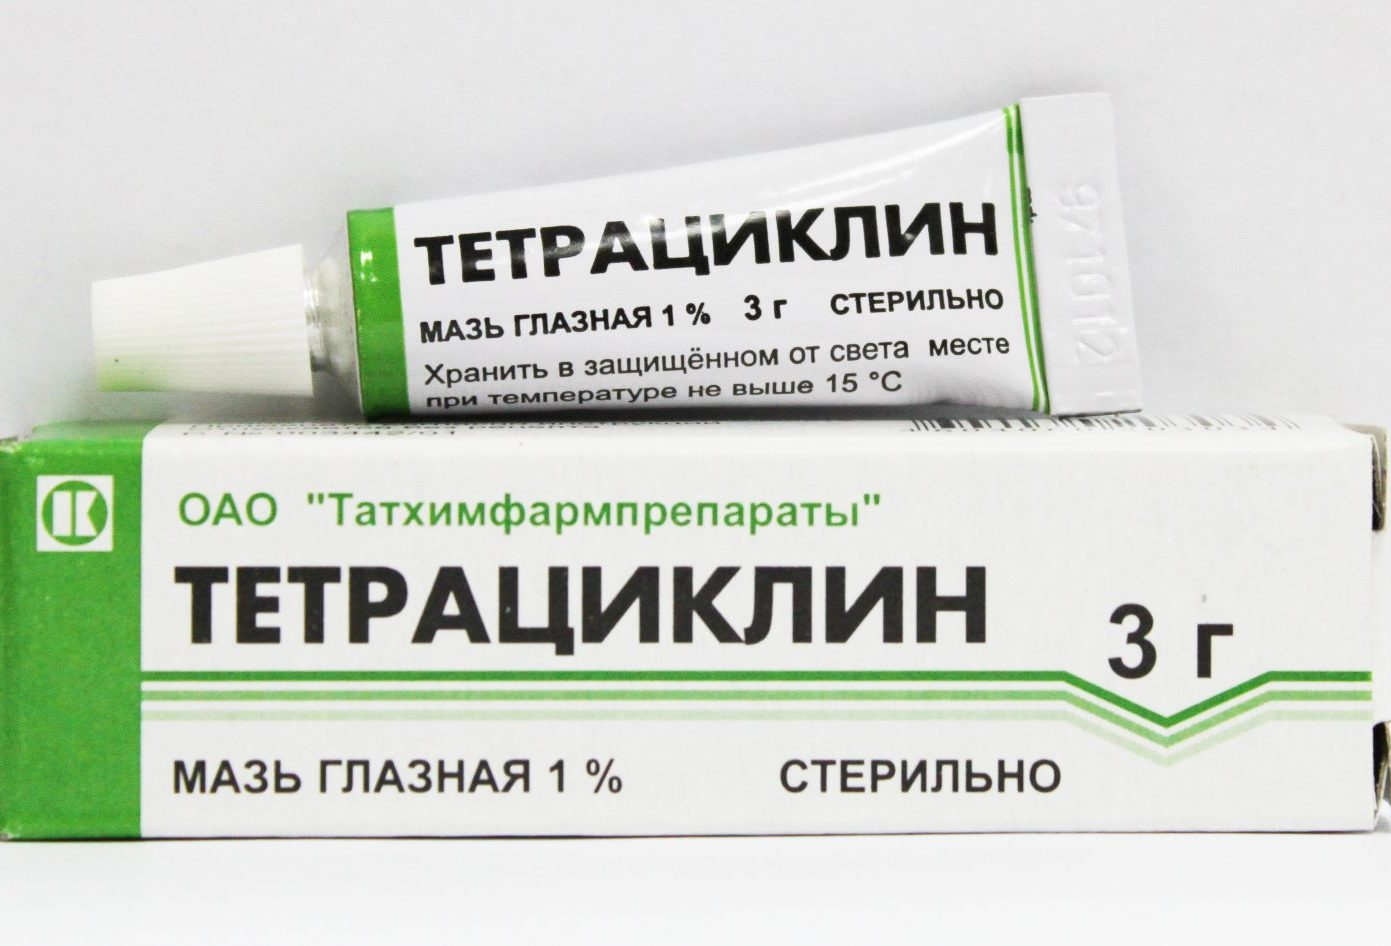 Тетрациклин от грибка ногтей